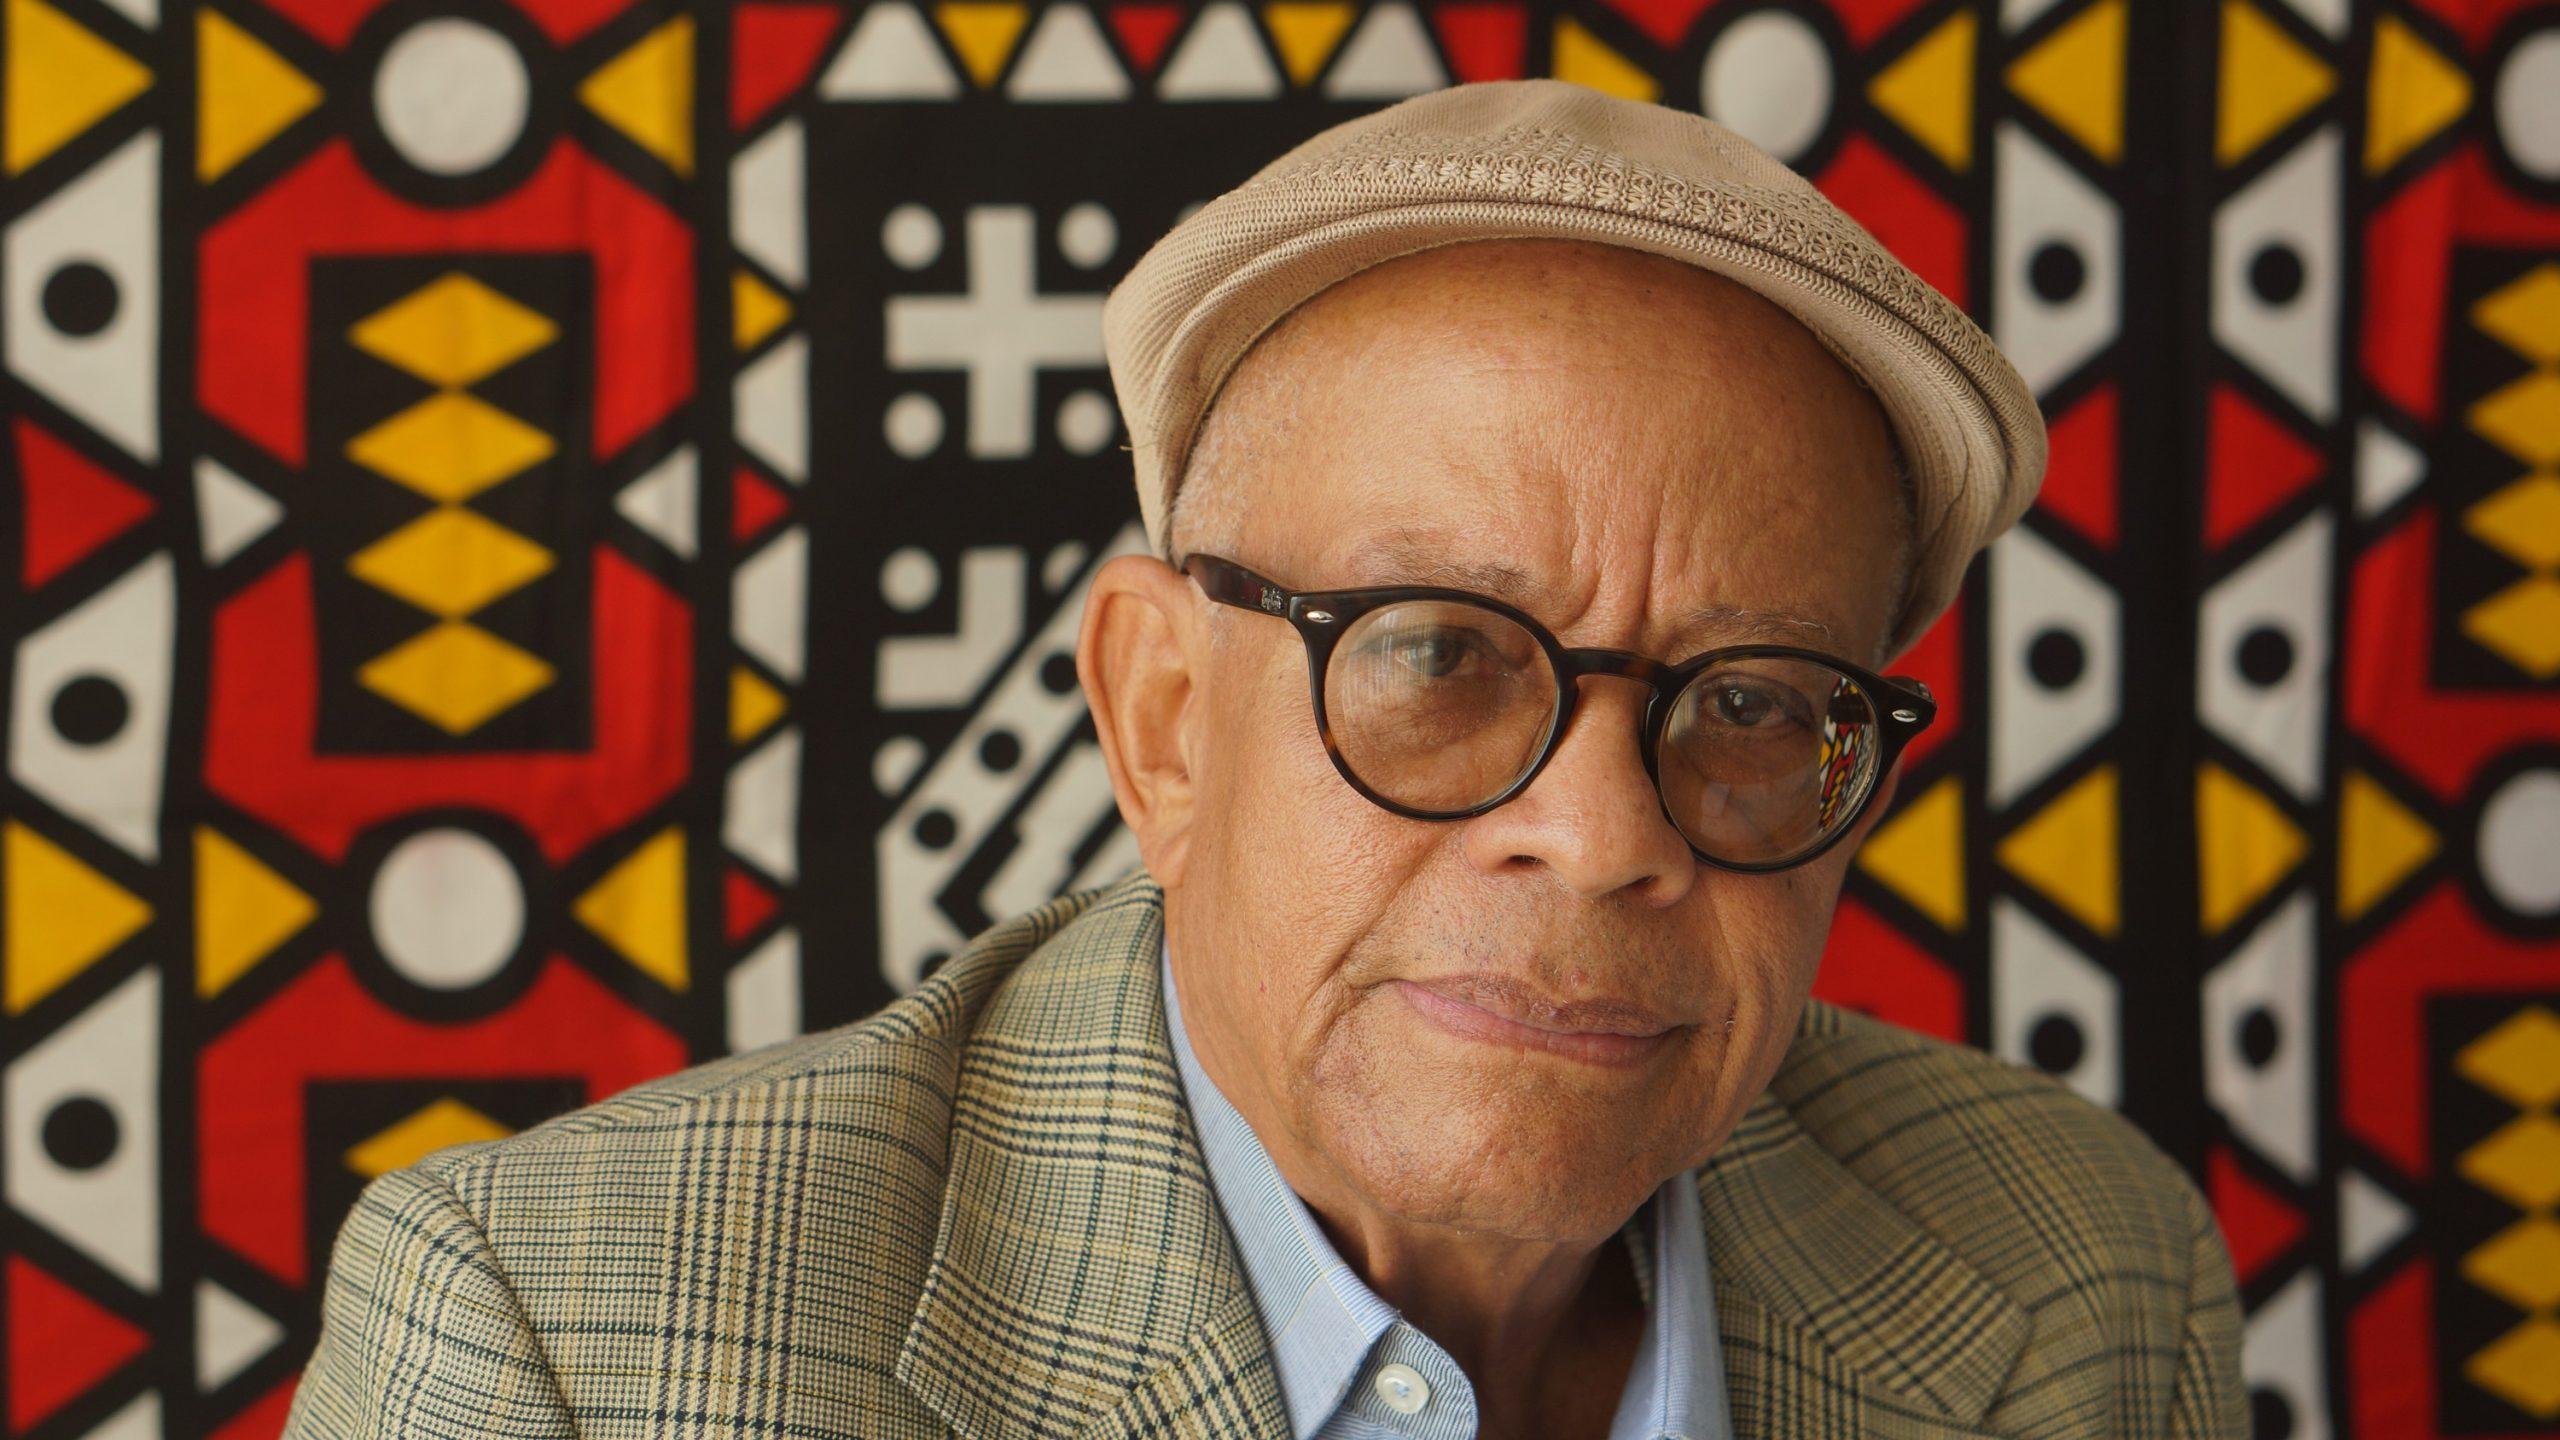 O cantor, compositor, pesquisador e escritor Nei Lopes - Foto: Jefferson Mello